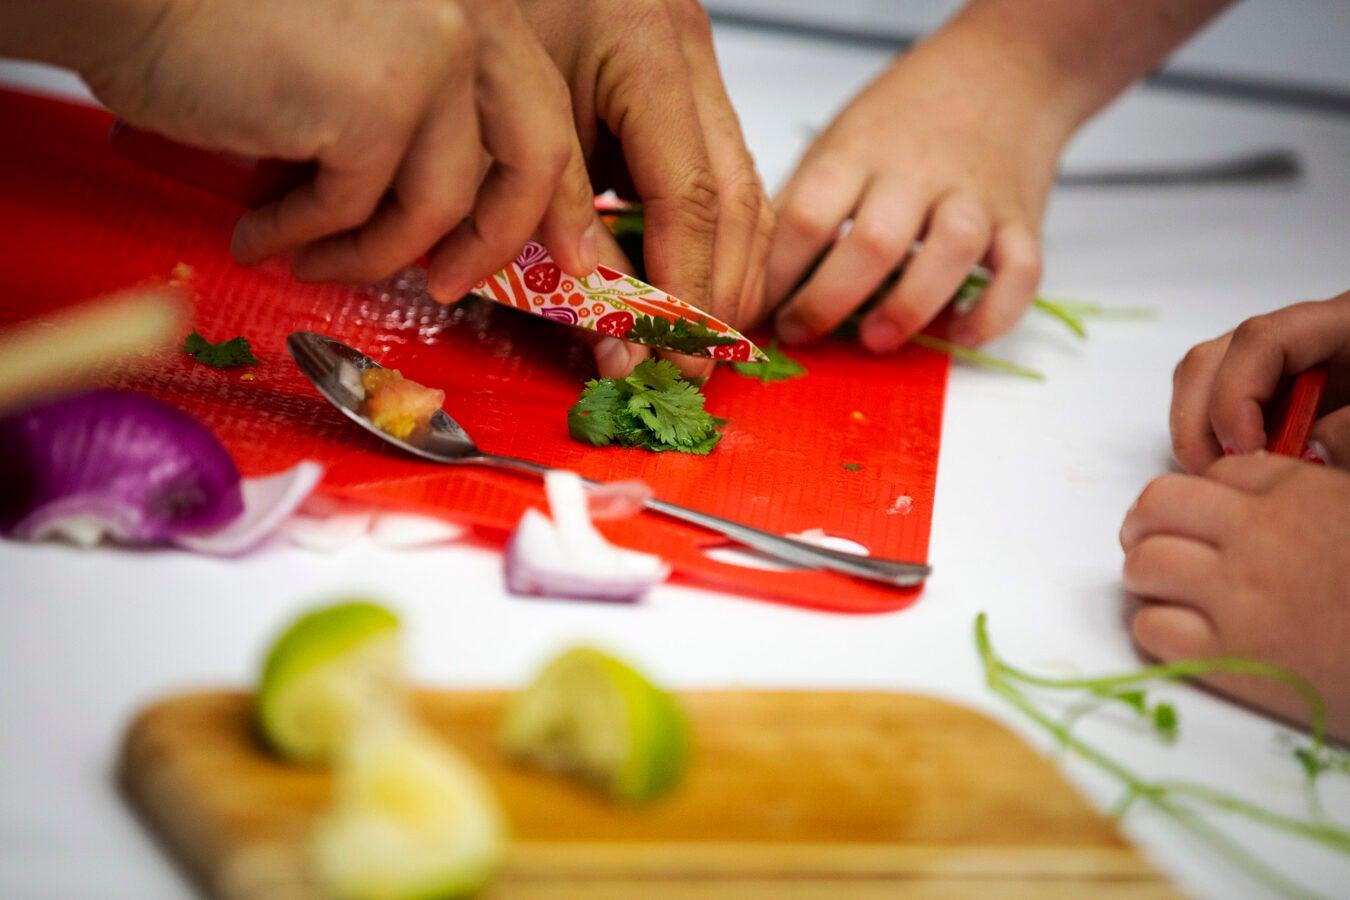 Students chop parsley.